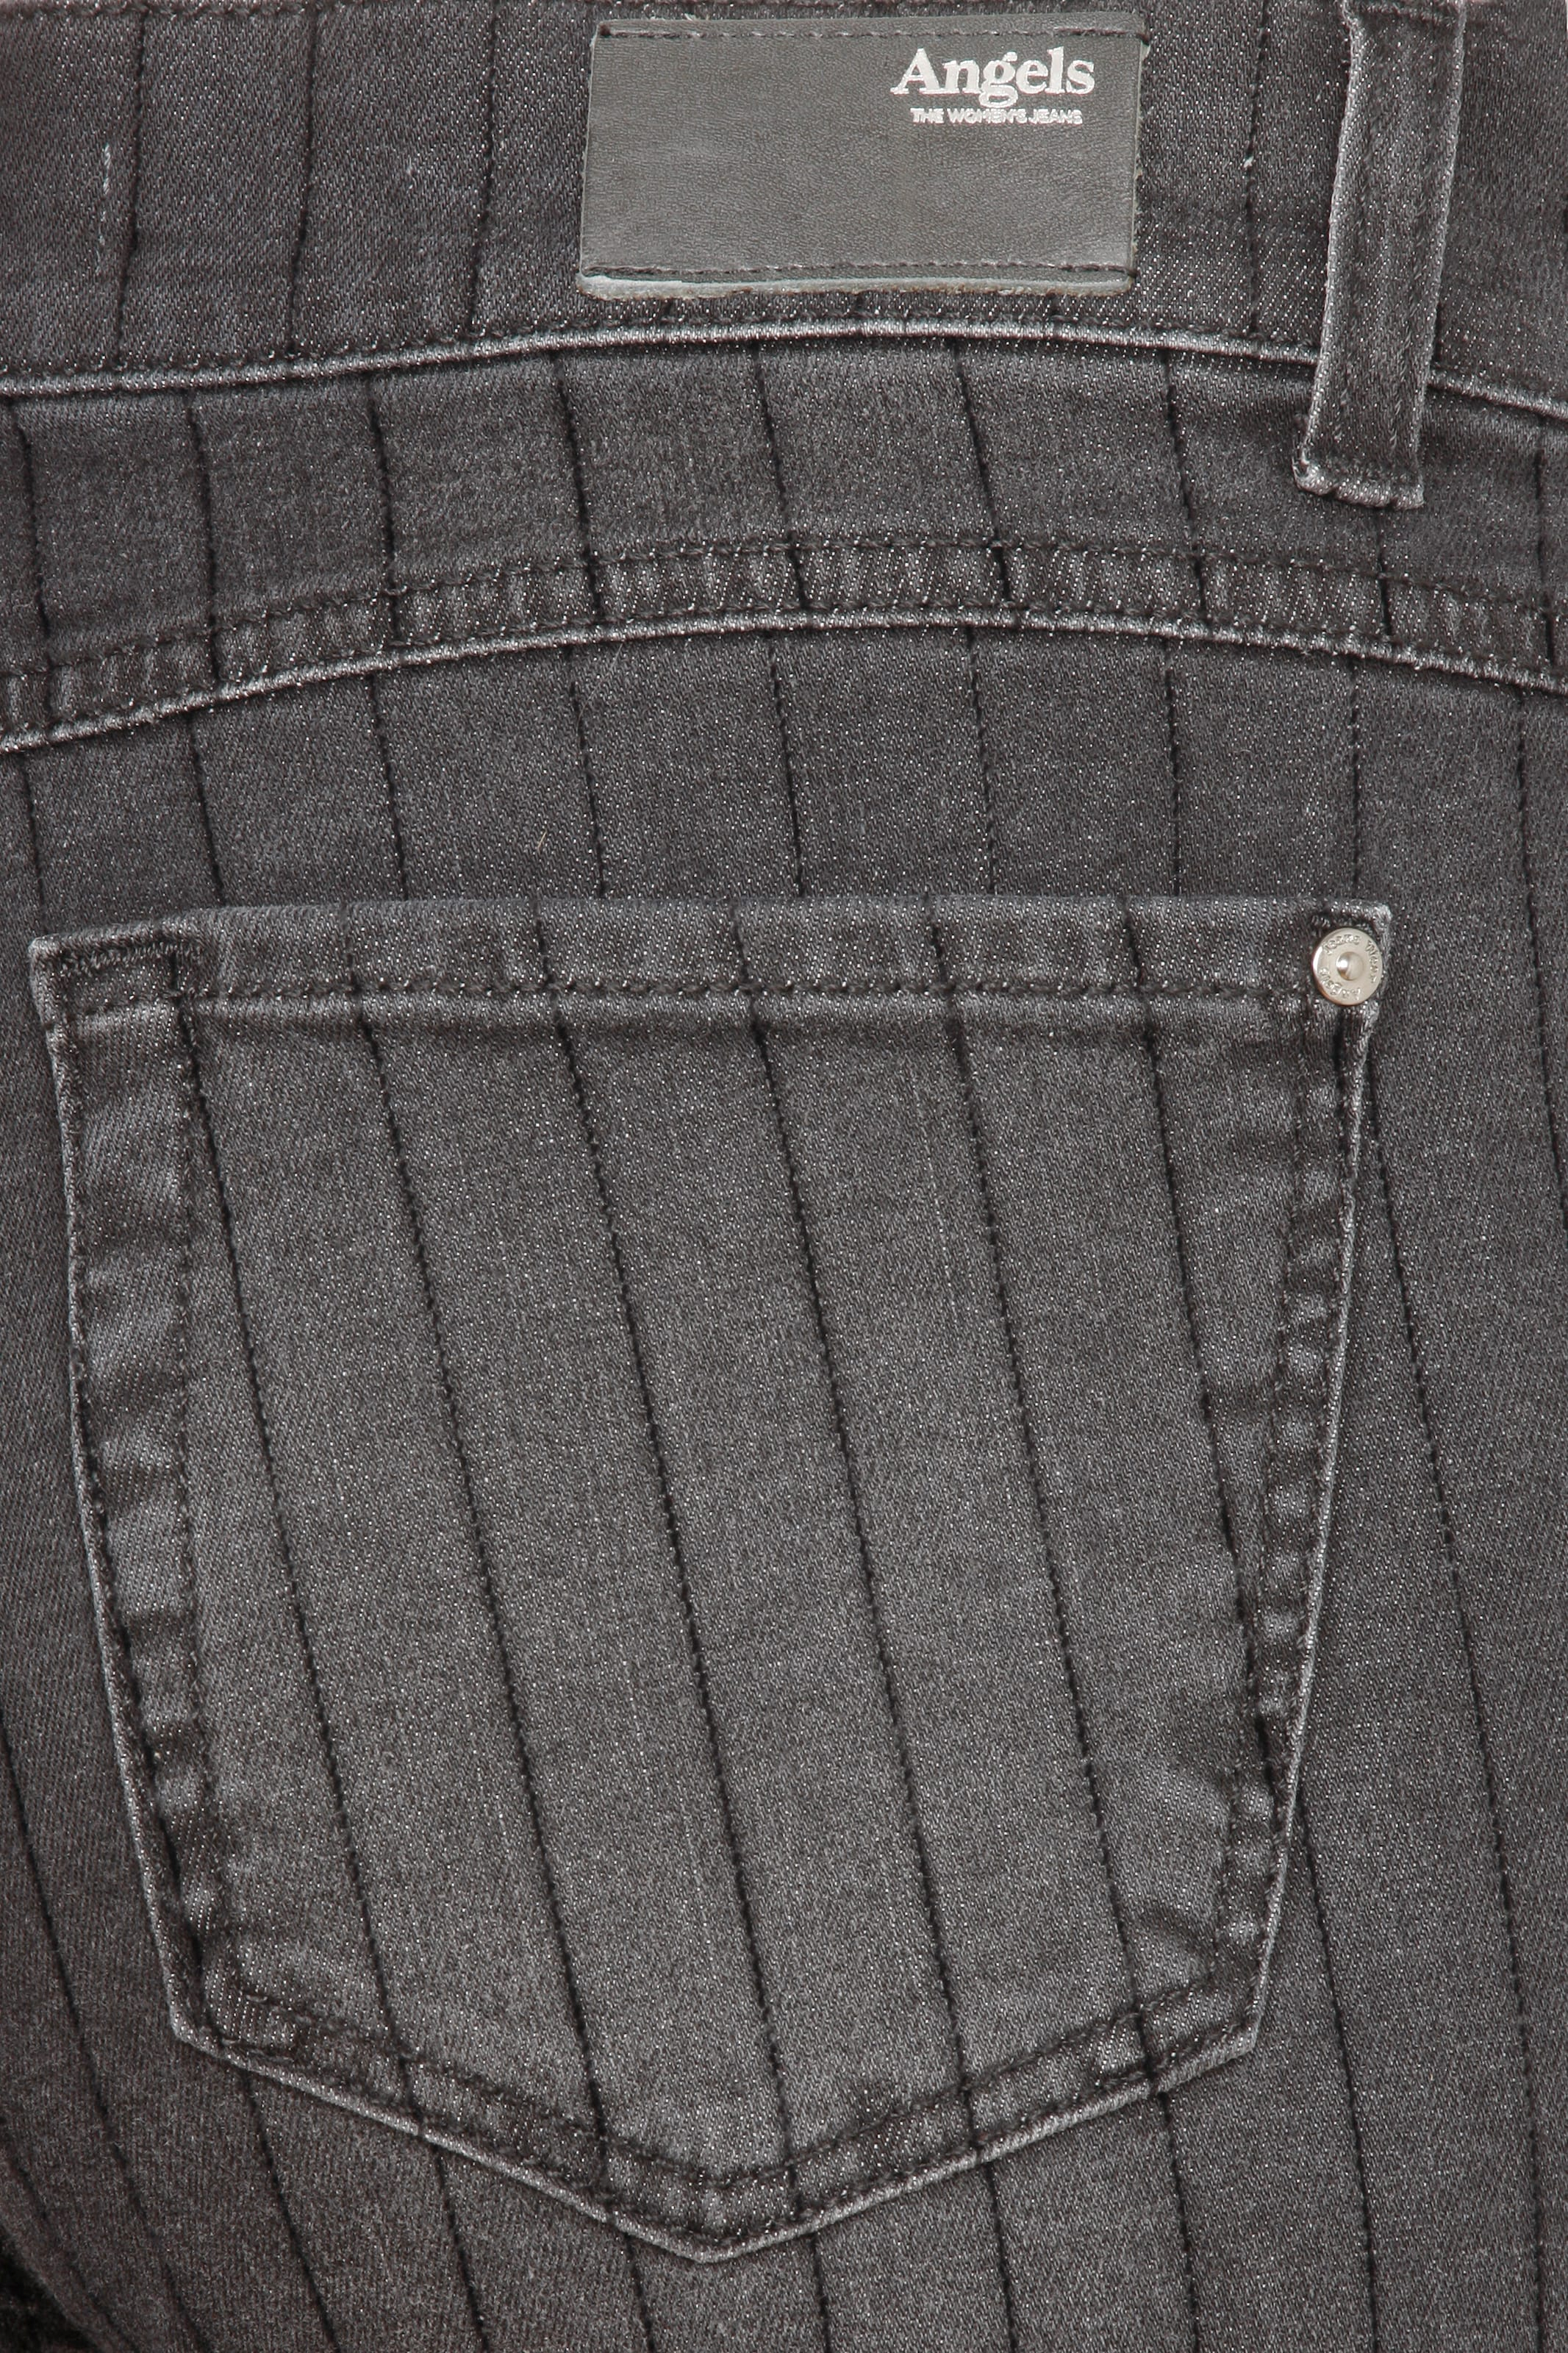 DunkelgrauSchwarz Jeans In Angels In DunkelgrauSchwarz Angels Angels Angels Jeans In DunkelgrauSchwarz Jeans tshQCrd